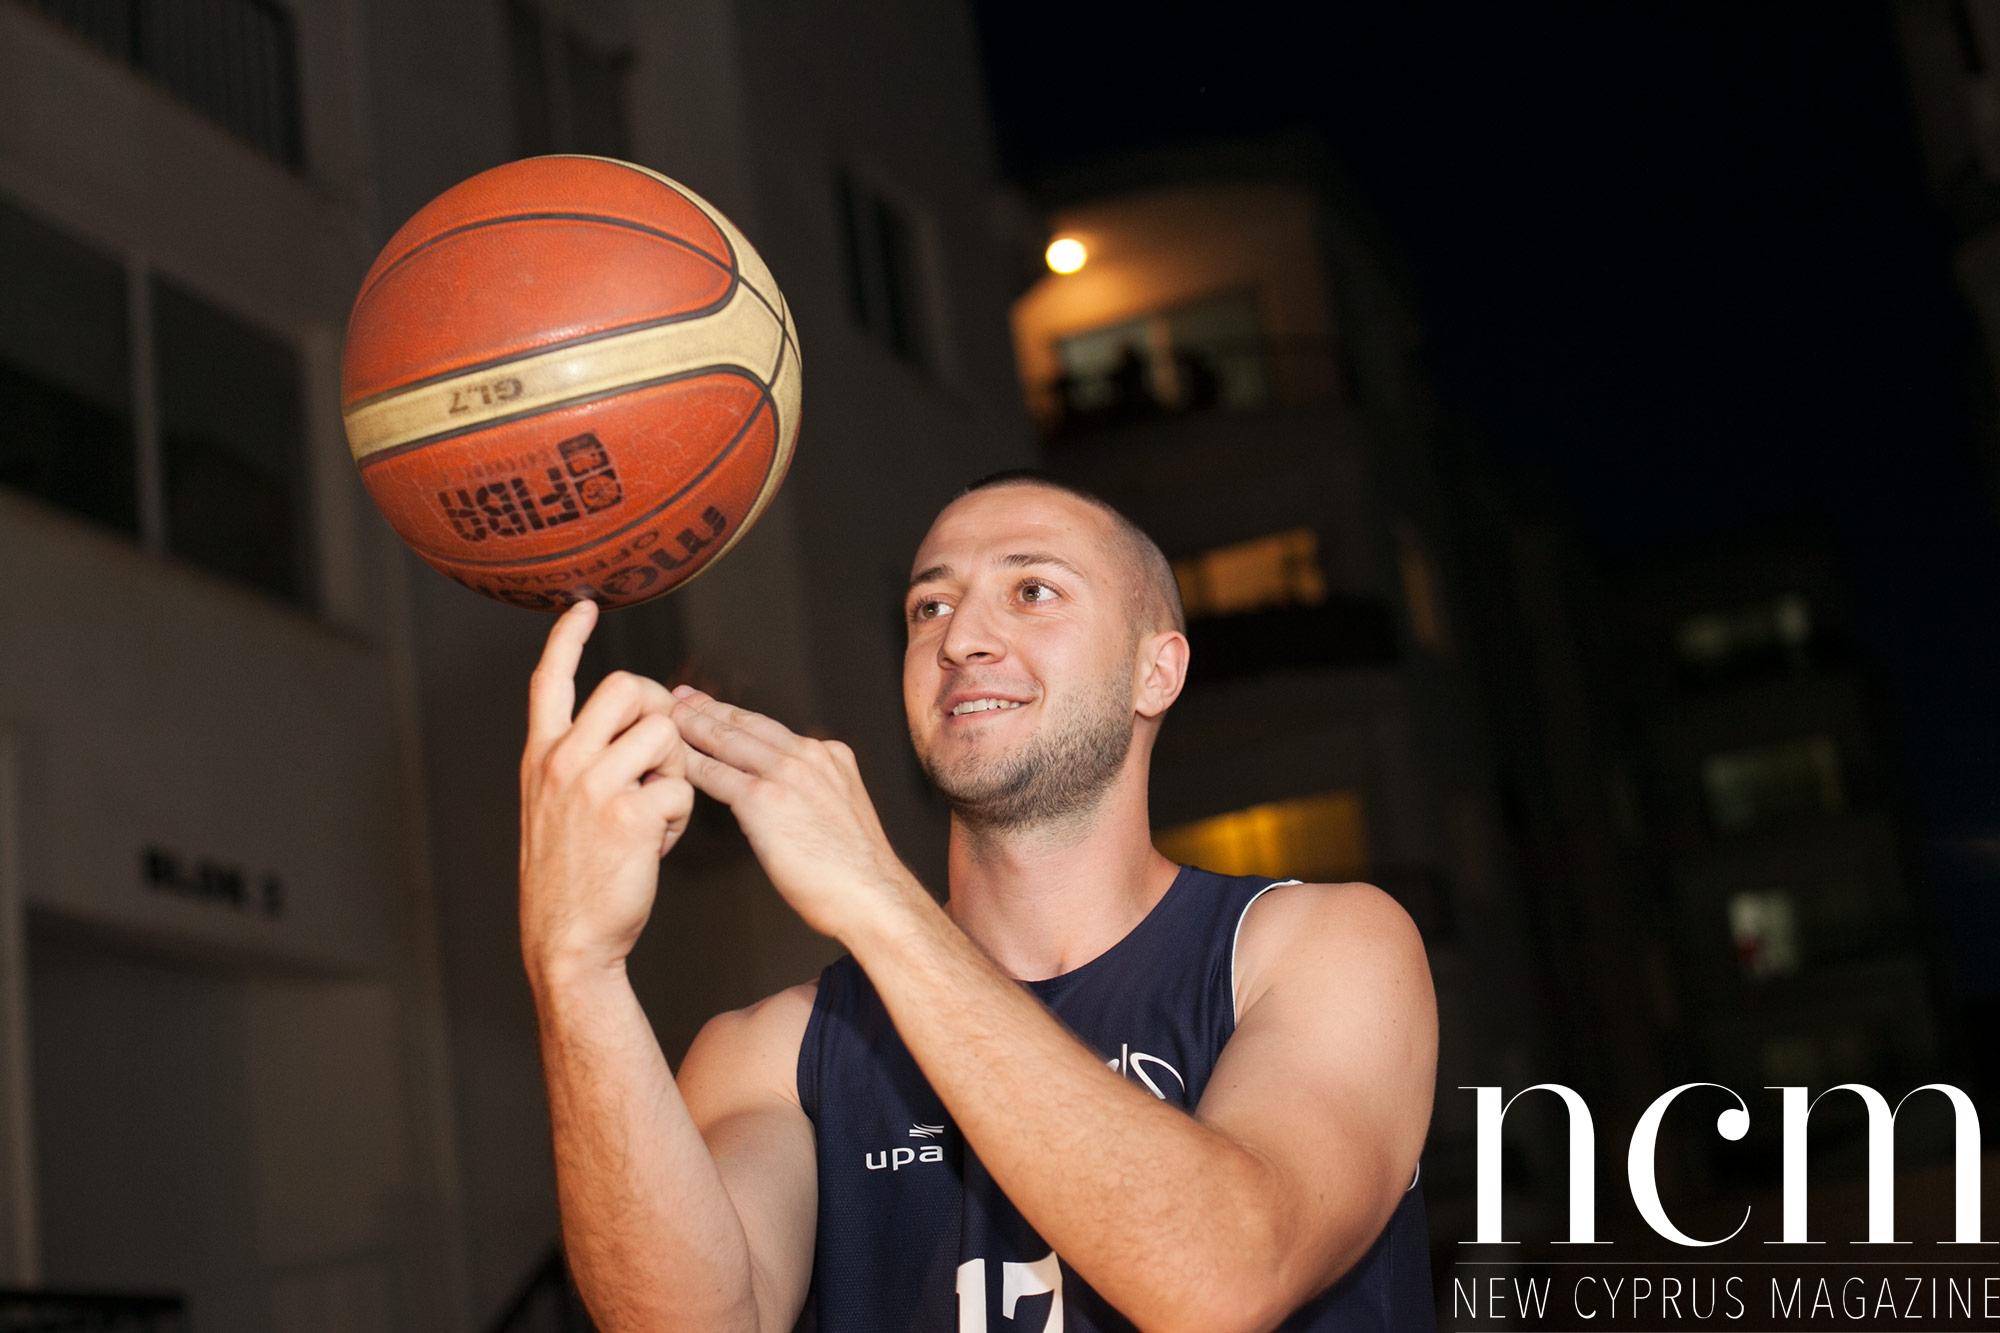 Saša Vural – Swedish basketball pro in North Cyprus